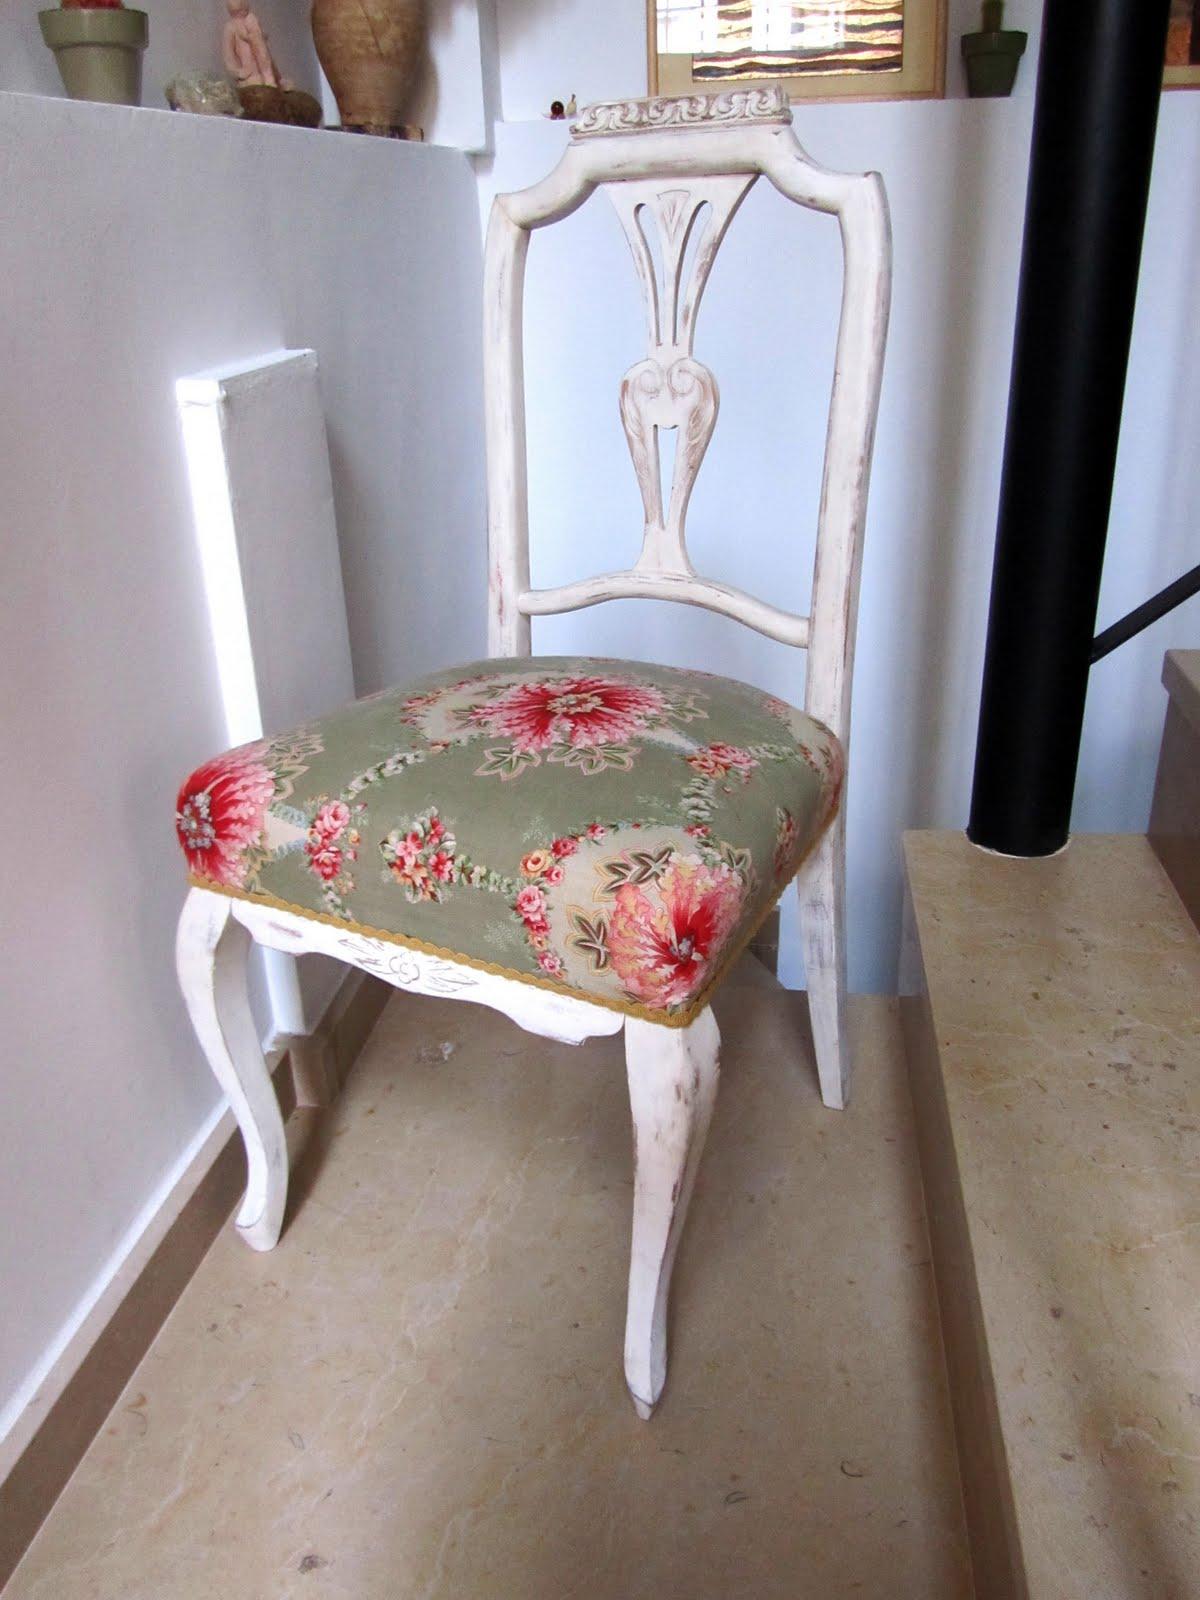 Isabel cosin renovar muebles - Renovar muebles antiguos ...